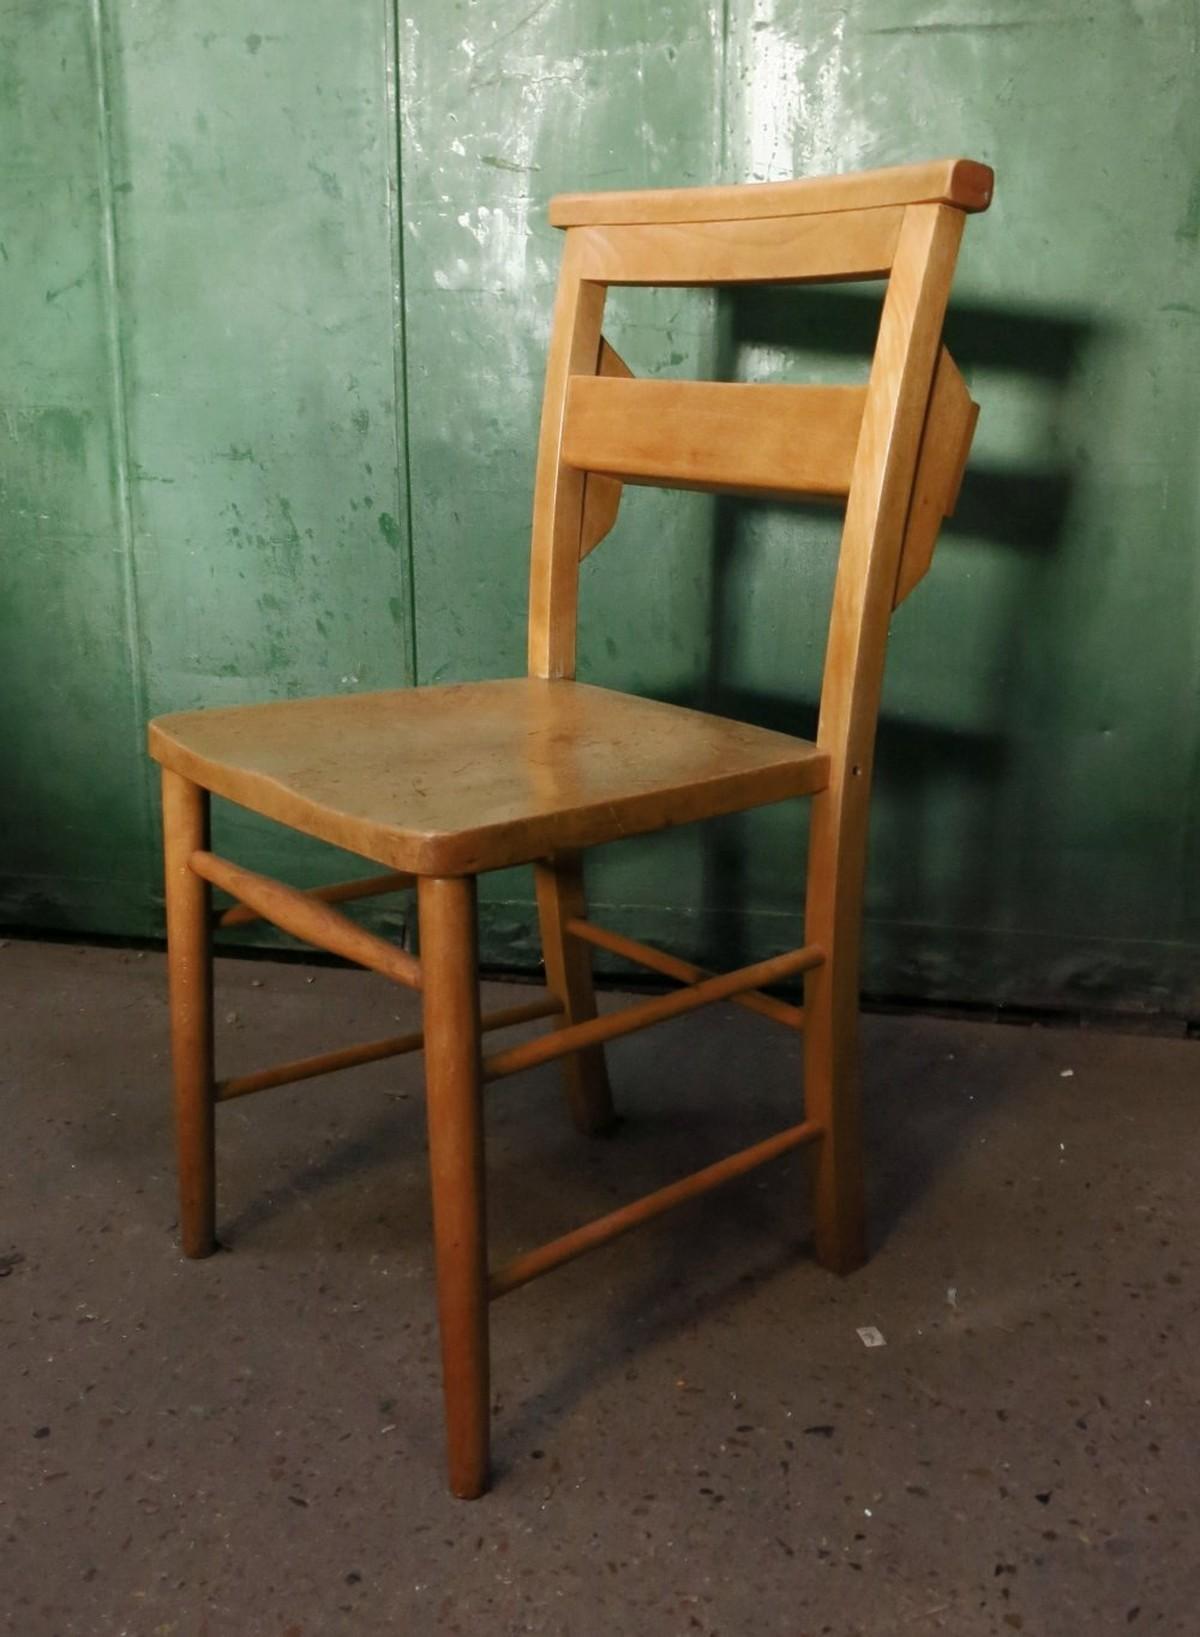 Ordinaire Church Pew Chairs